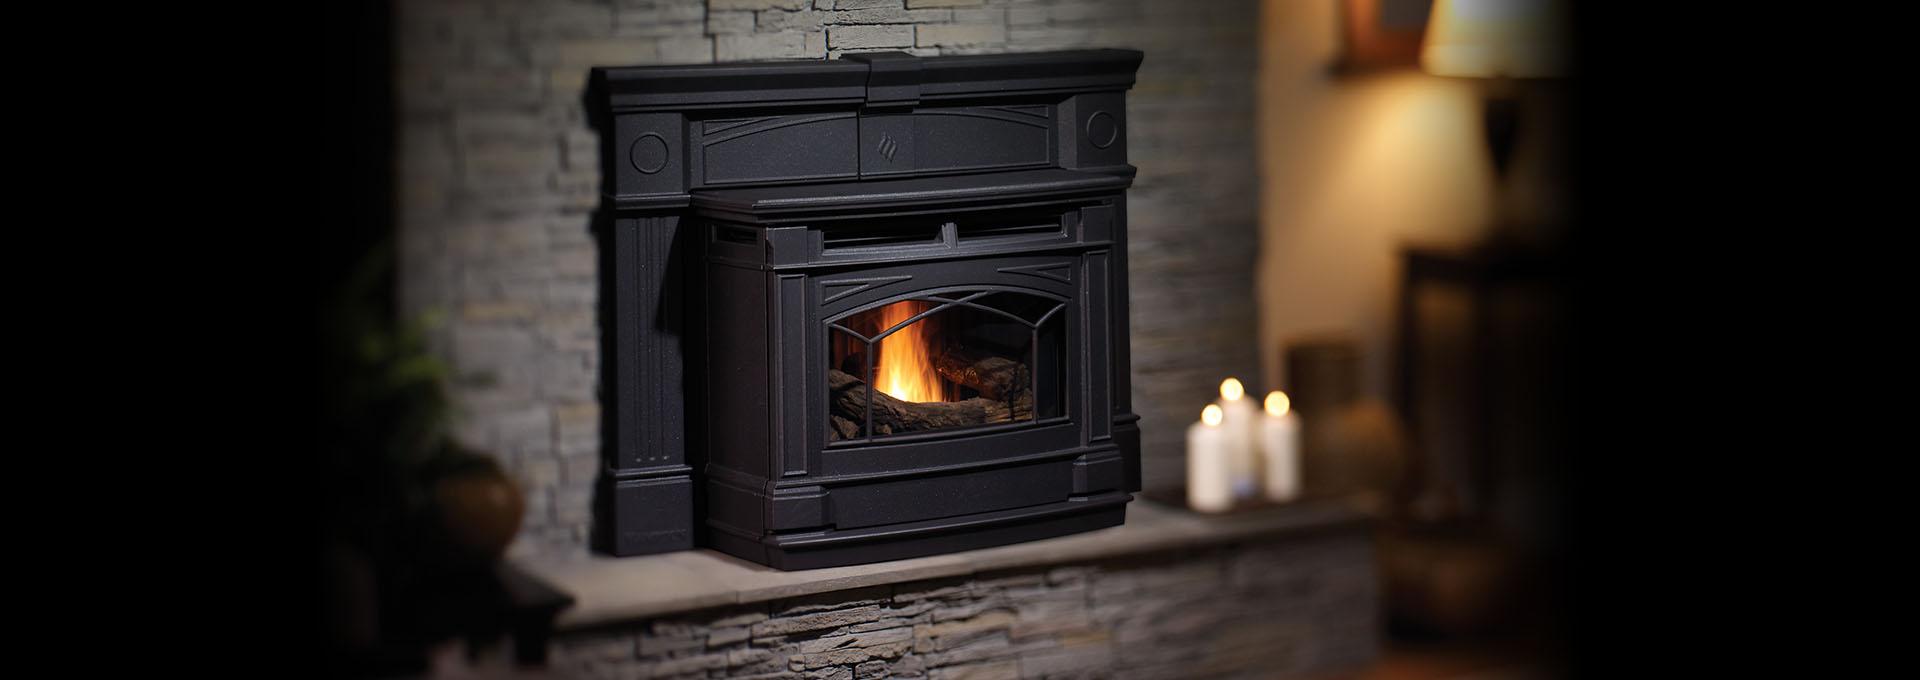 pellet inserts regency fireplace products rh regency fire com fireplace pellet inserts lowe's pellet fireplace insert canada